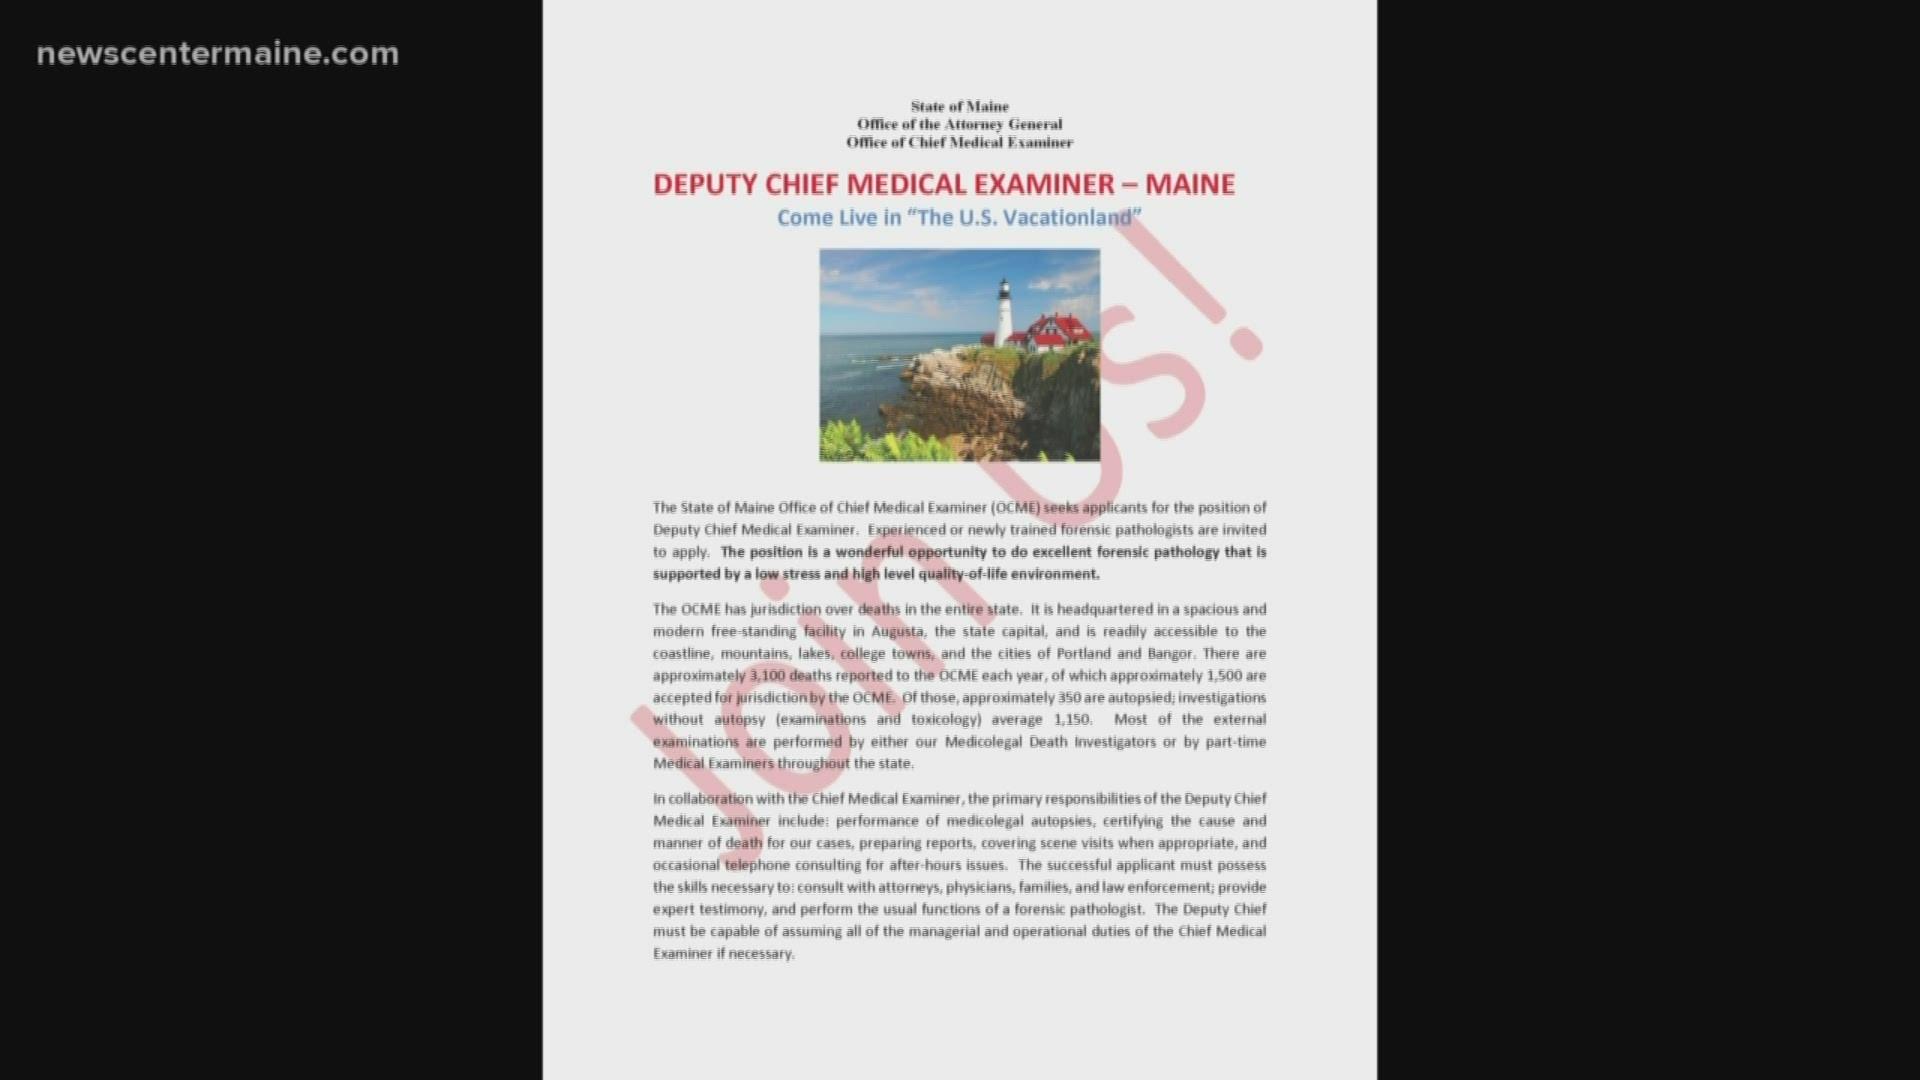 State Representative Files Complaint Over Medical Examiner Job Ad Wnep Com